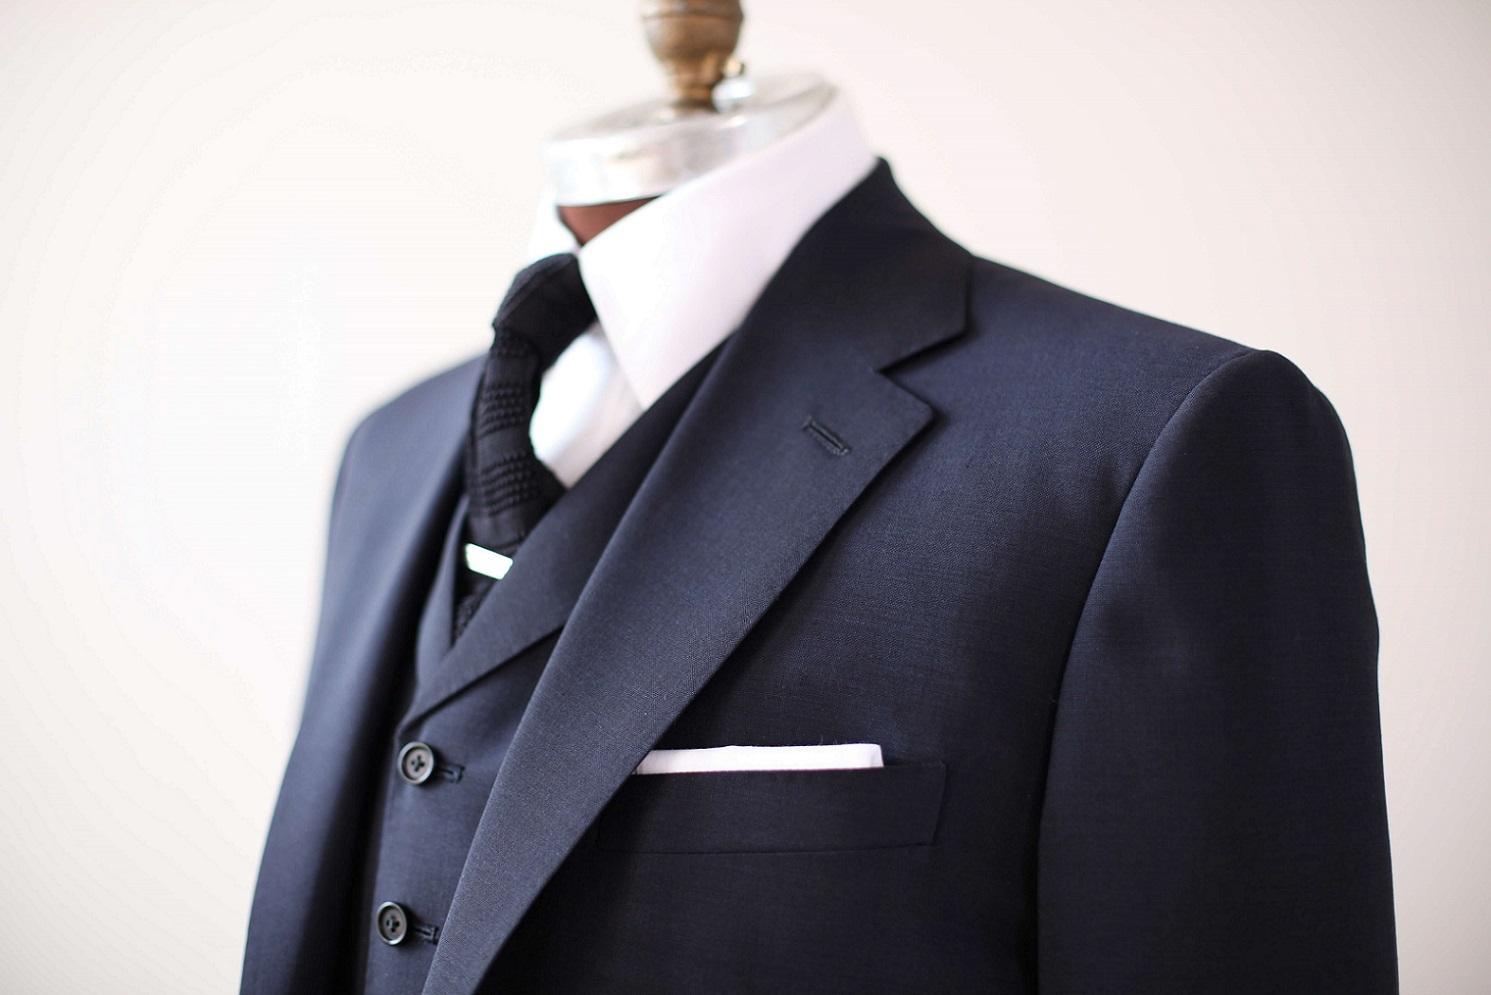 Сошью костюм на заказ 58